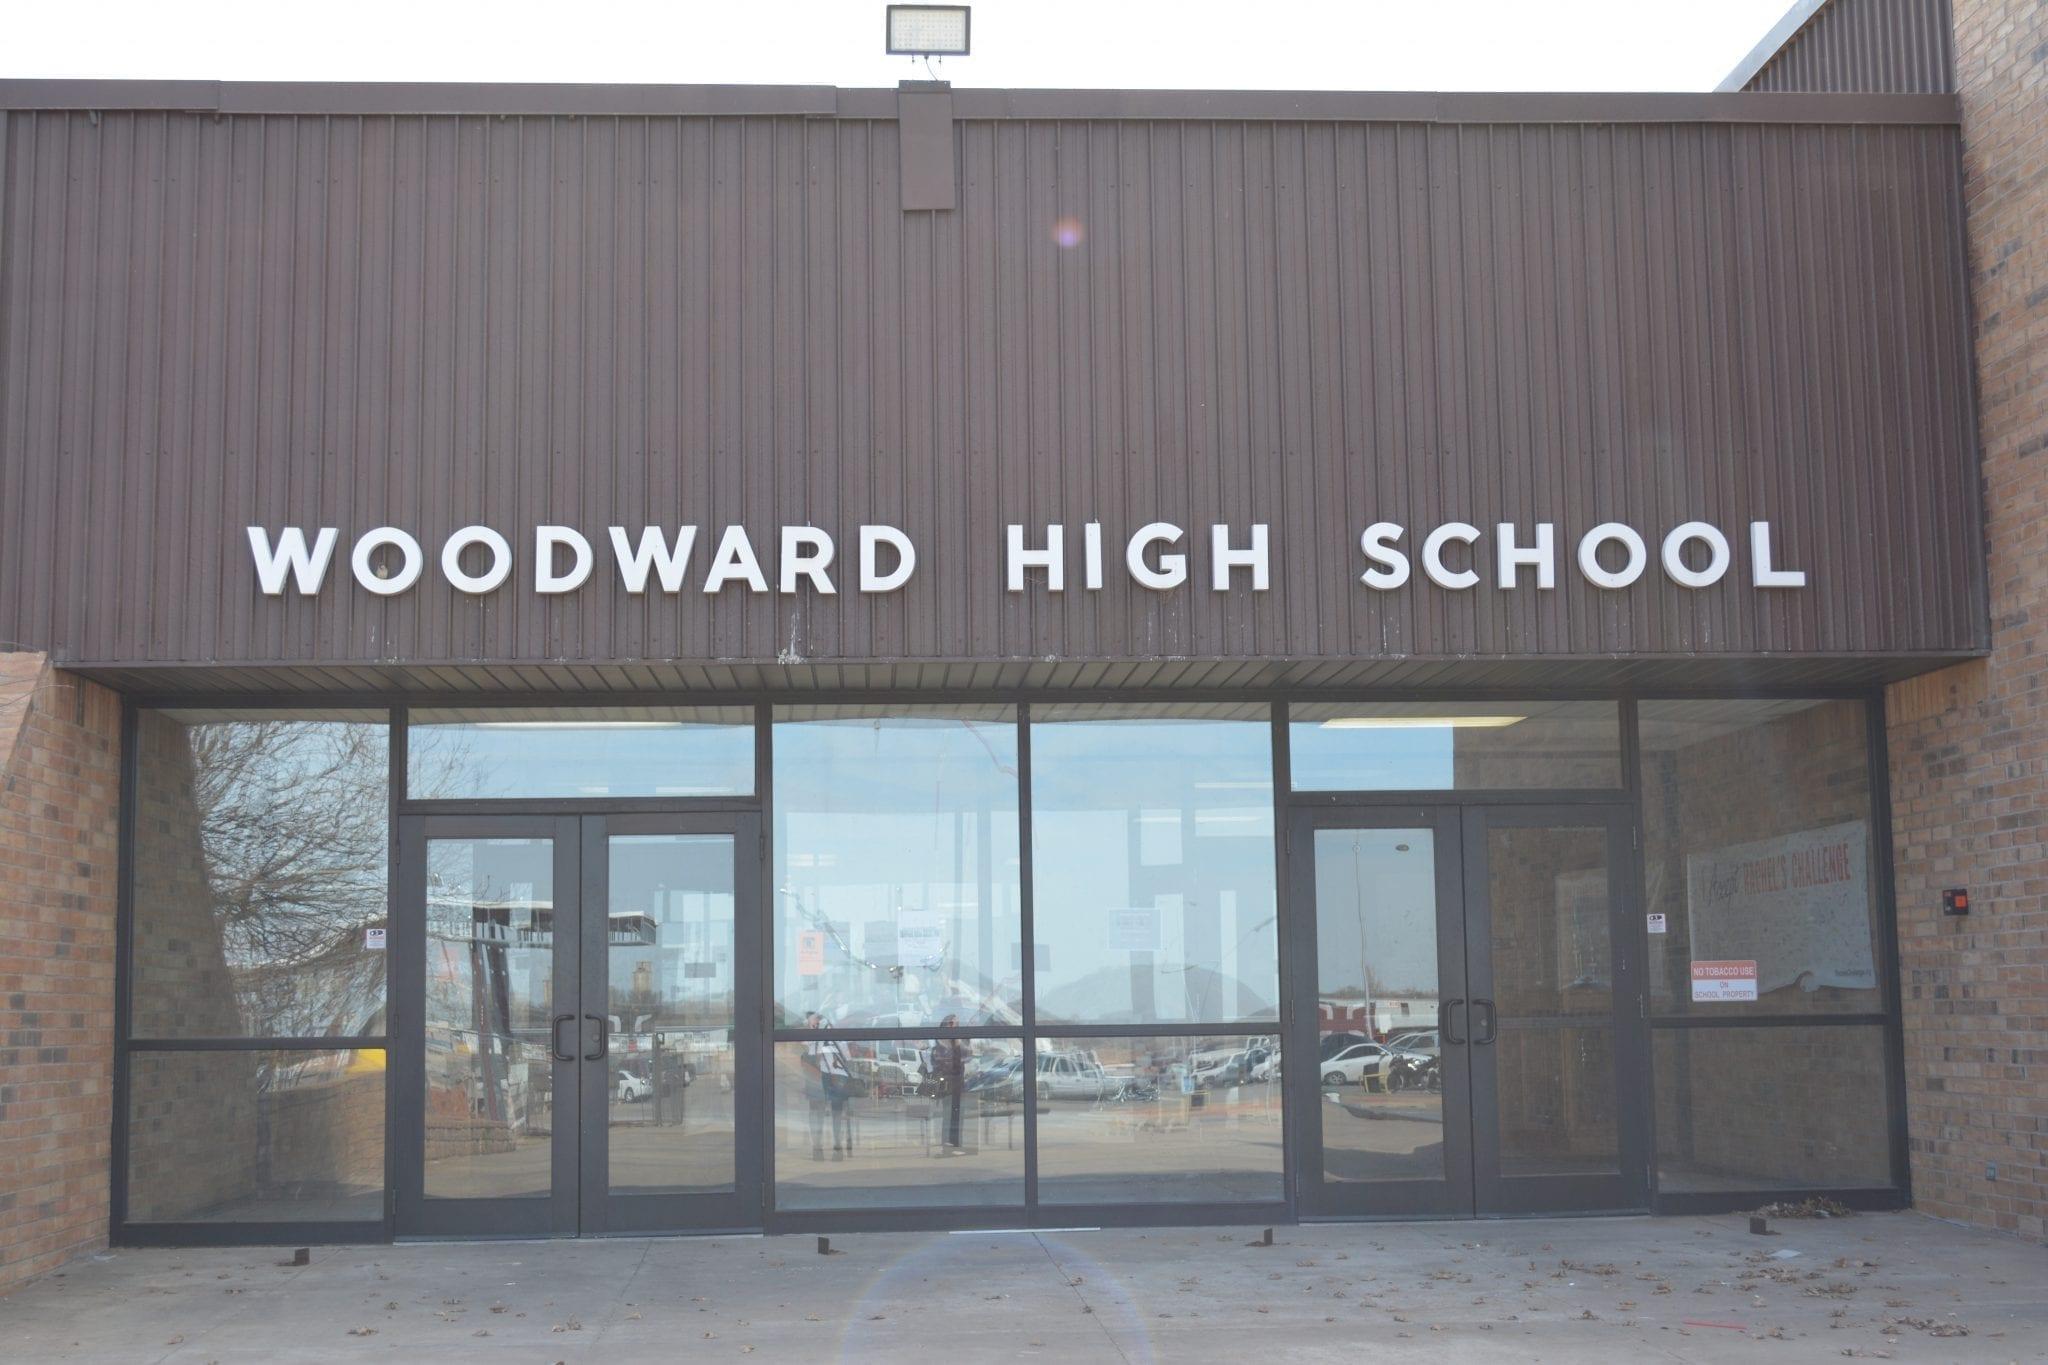 Entrance to Woodward High School